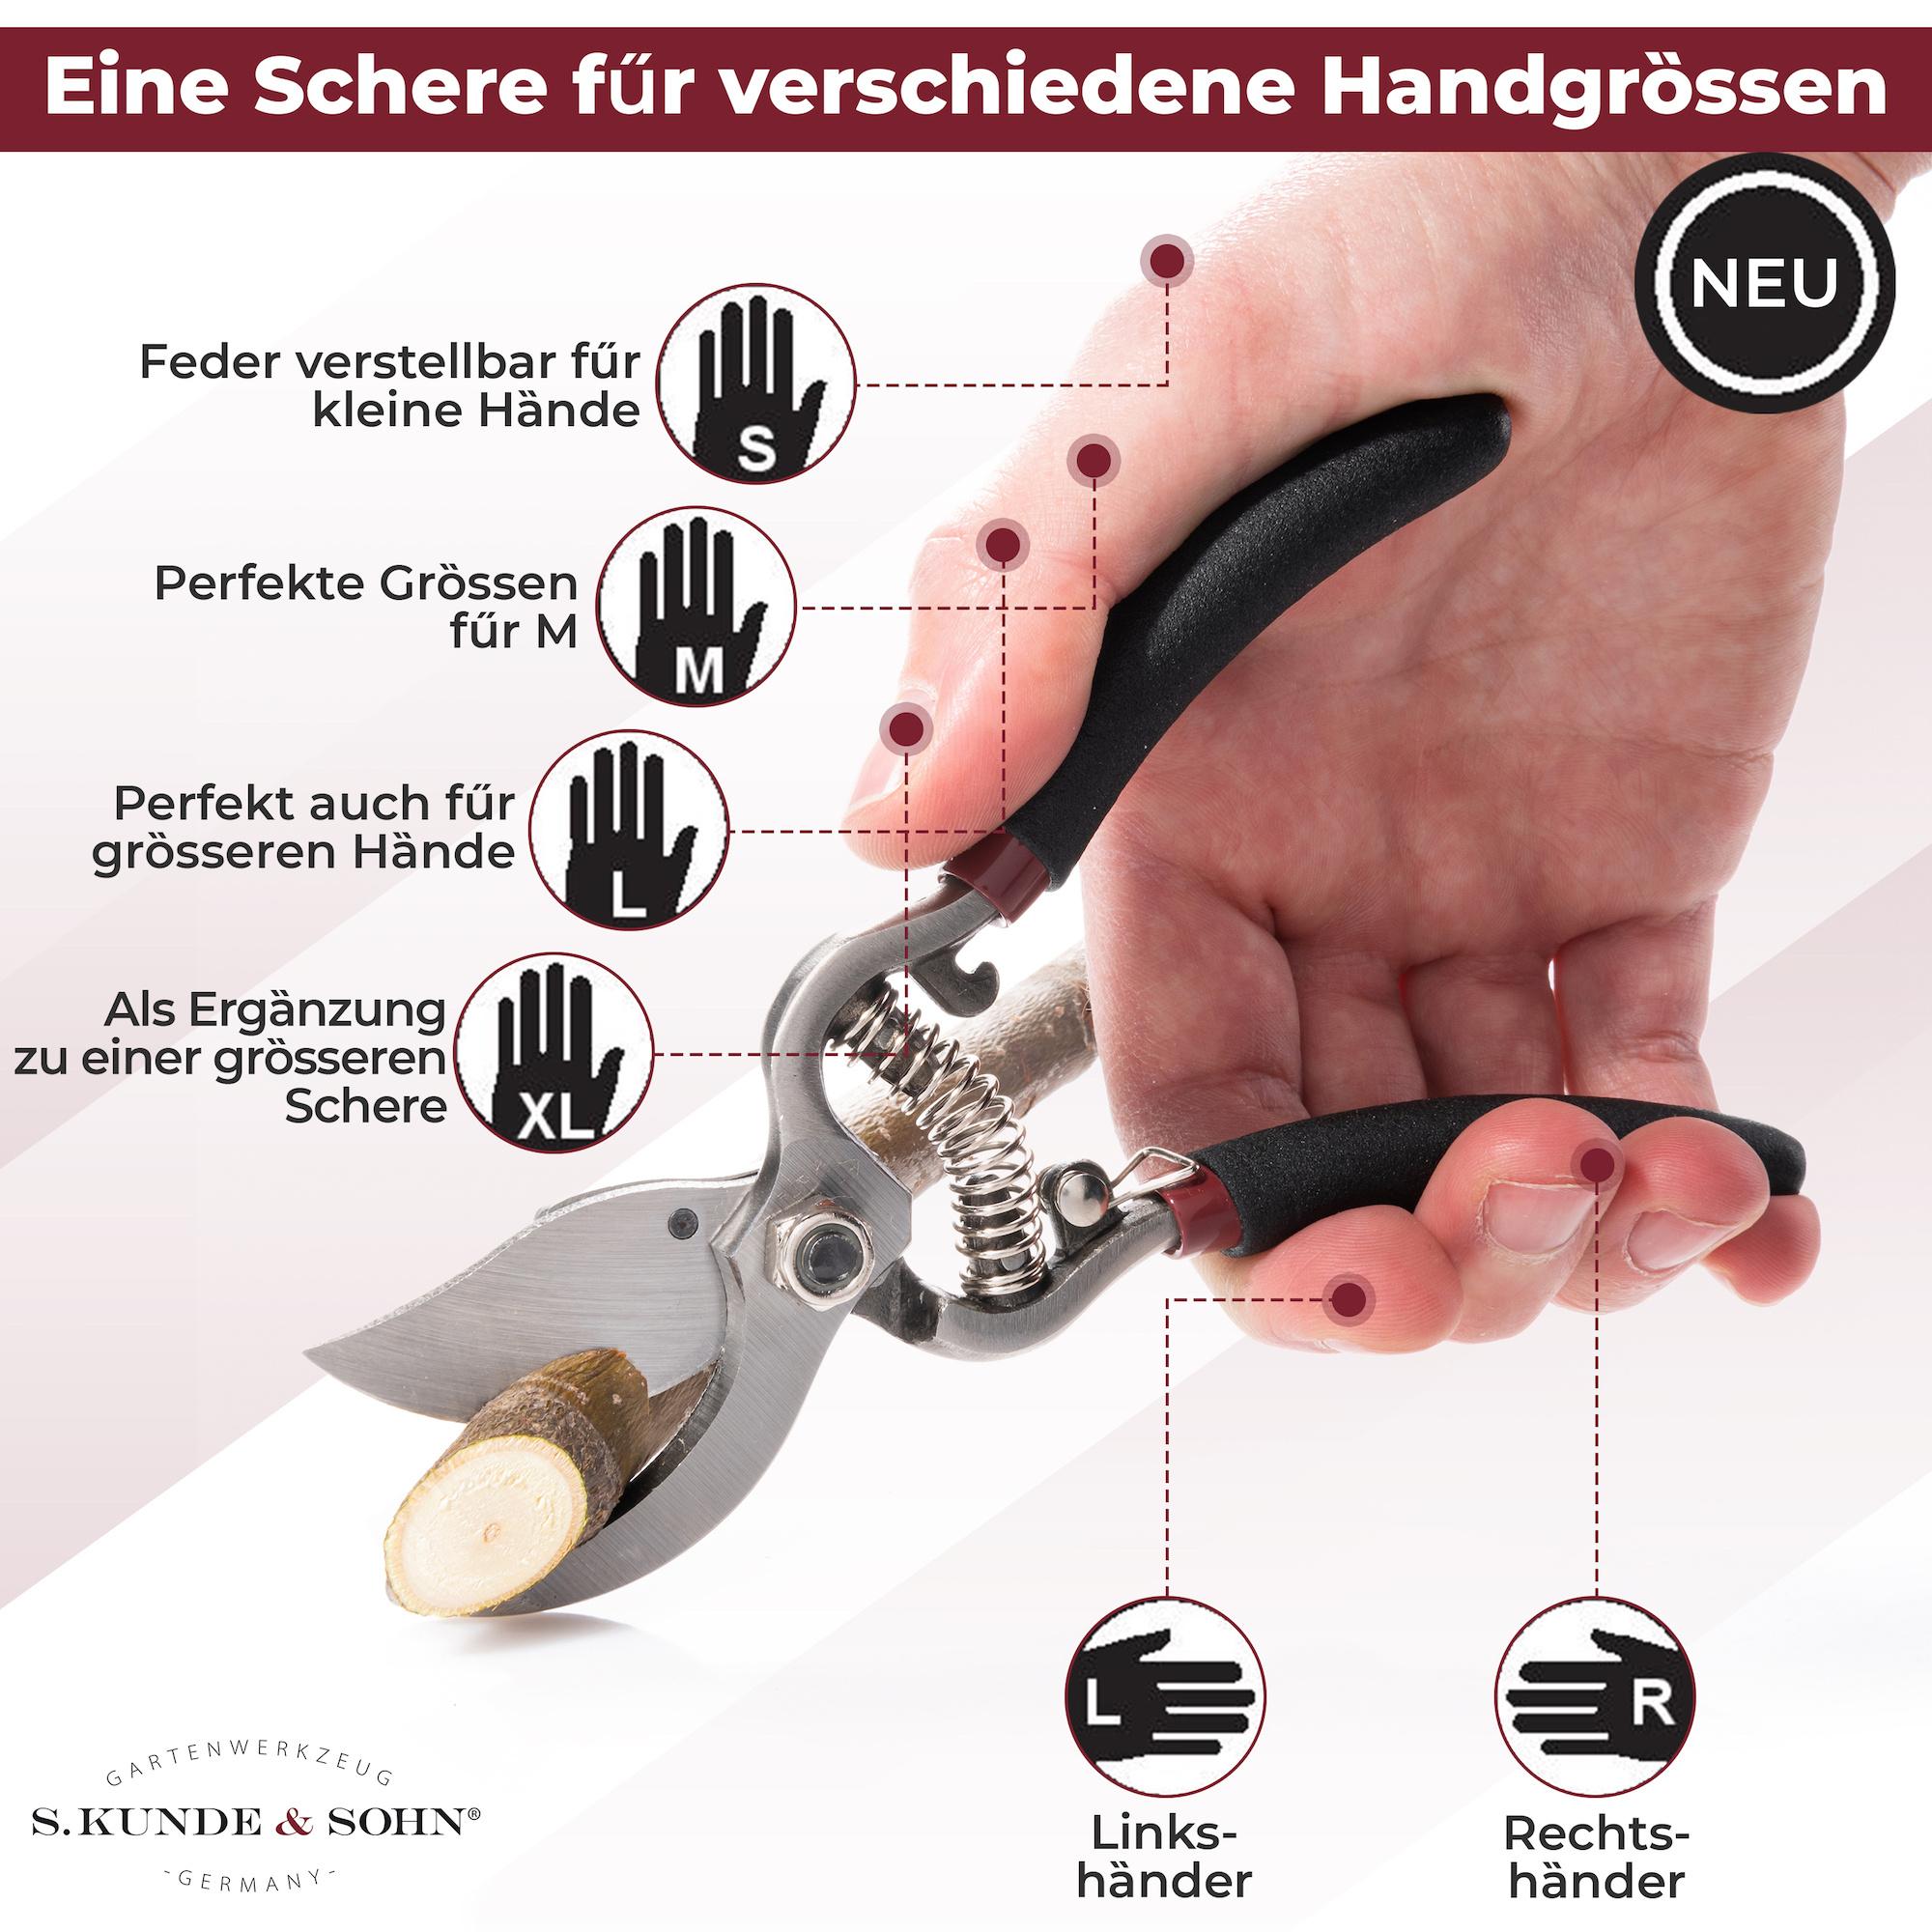 S. Kunde & Sohn Germany SKS 6 Tradition schwarz/Klinge silber  4er Set - 2 Scheren + 2 Ersatzklingen